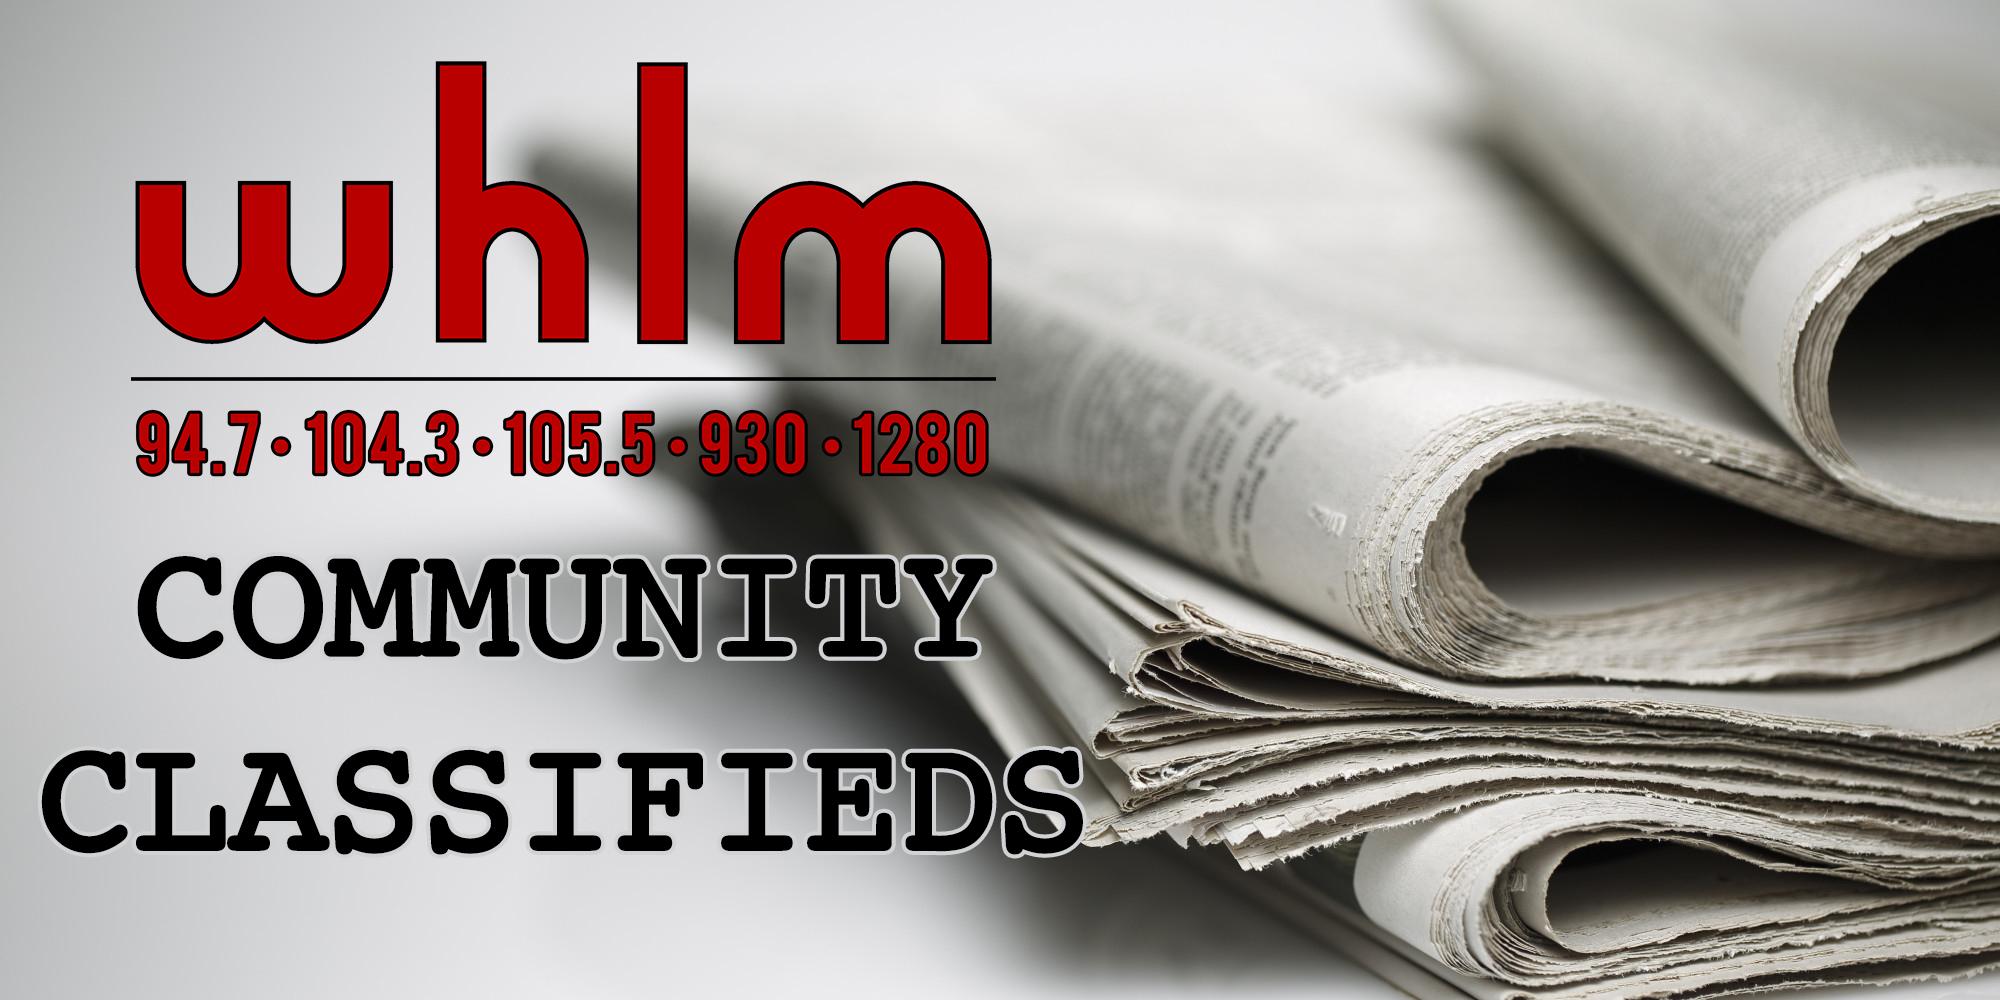 community classifieds